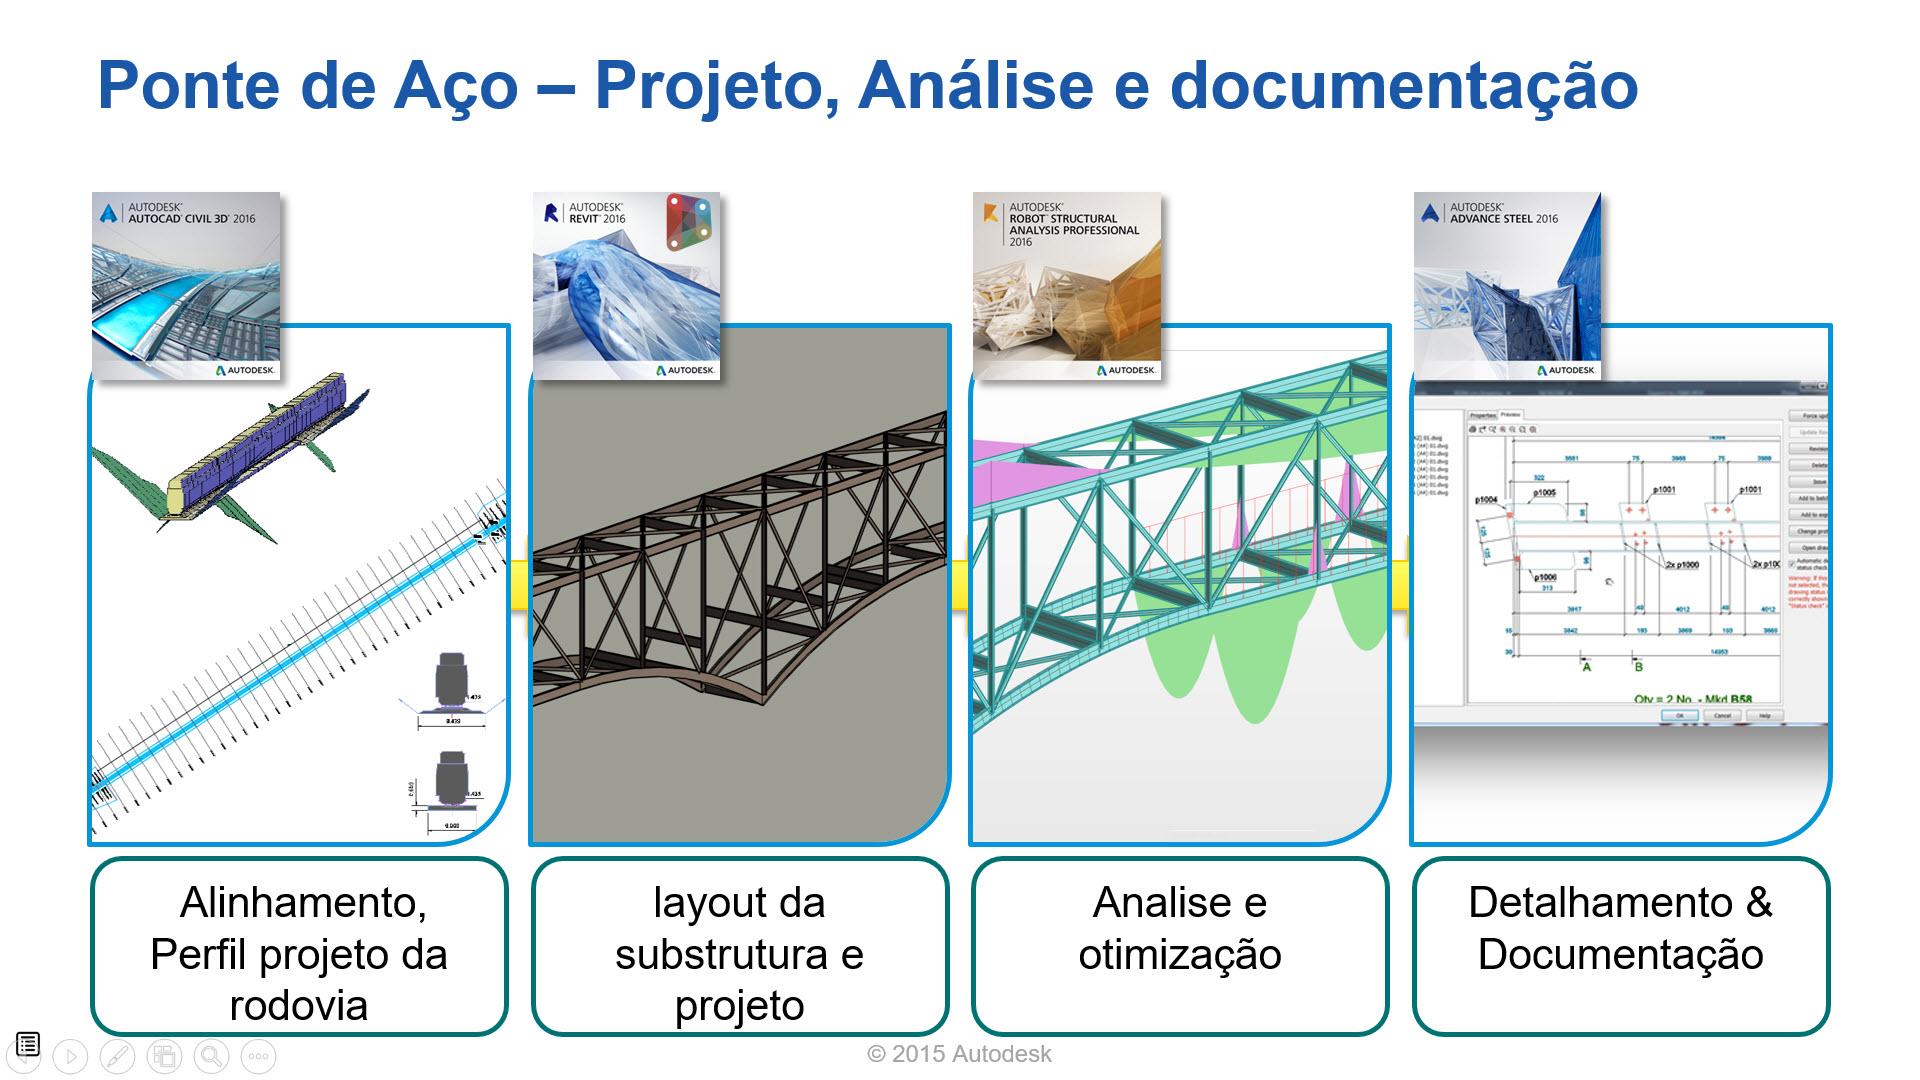 AUBR-92_Fluxo_pontes